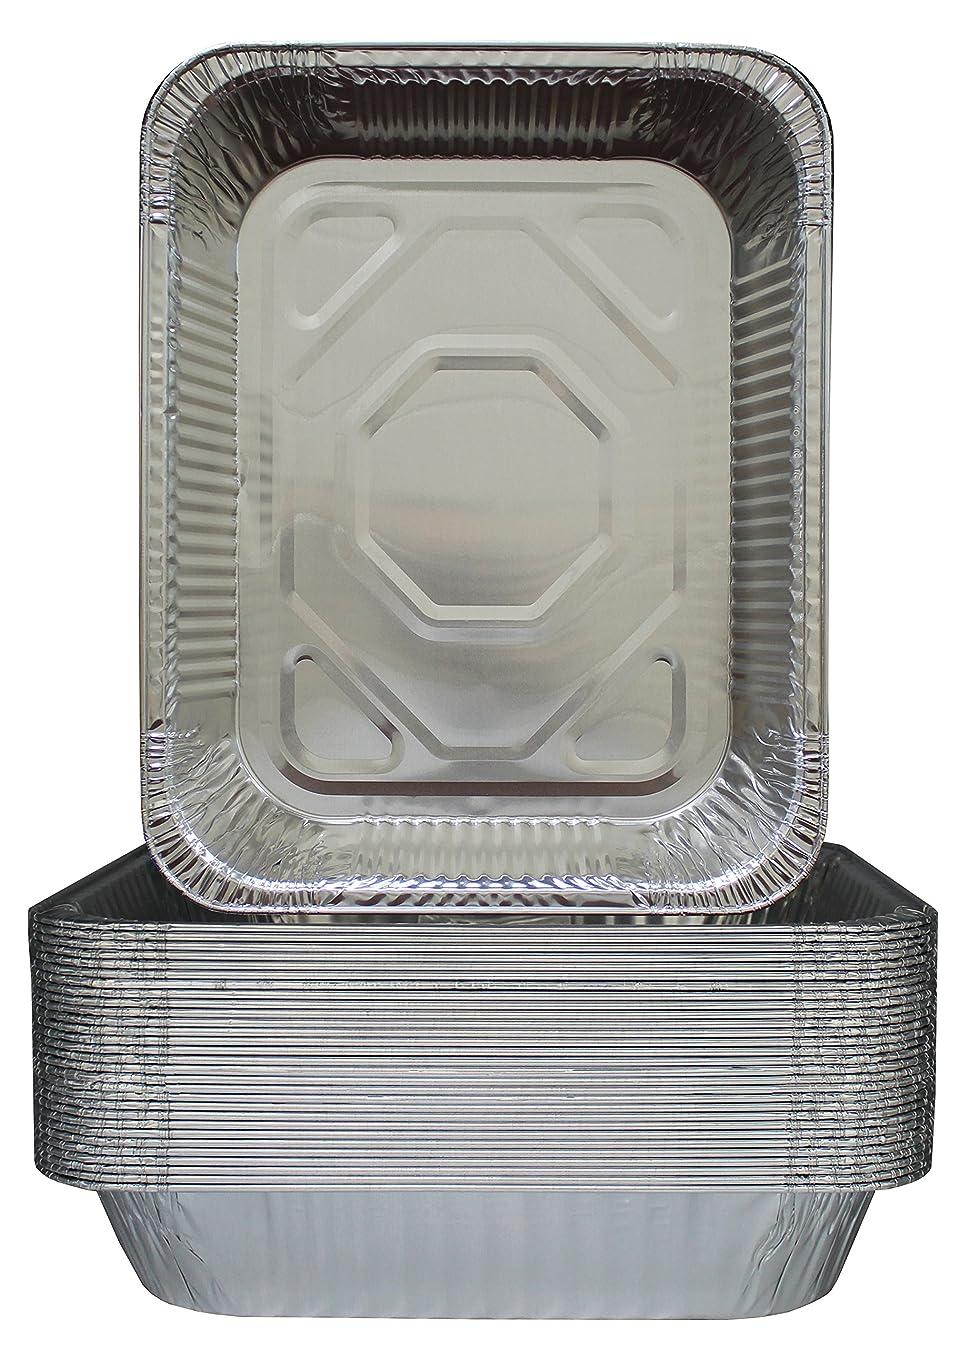 30-Pack Aluminum Half-Size Roasting Pans - Super-Thick 9x13